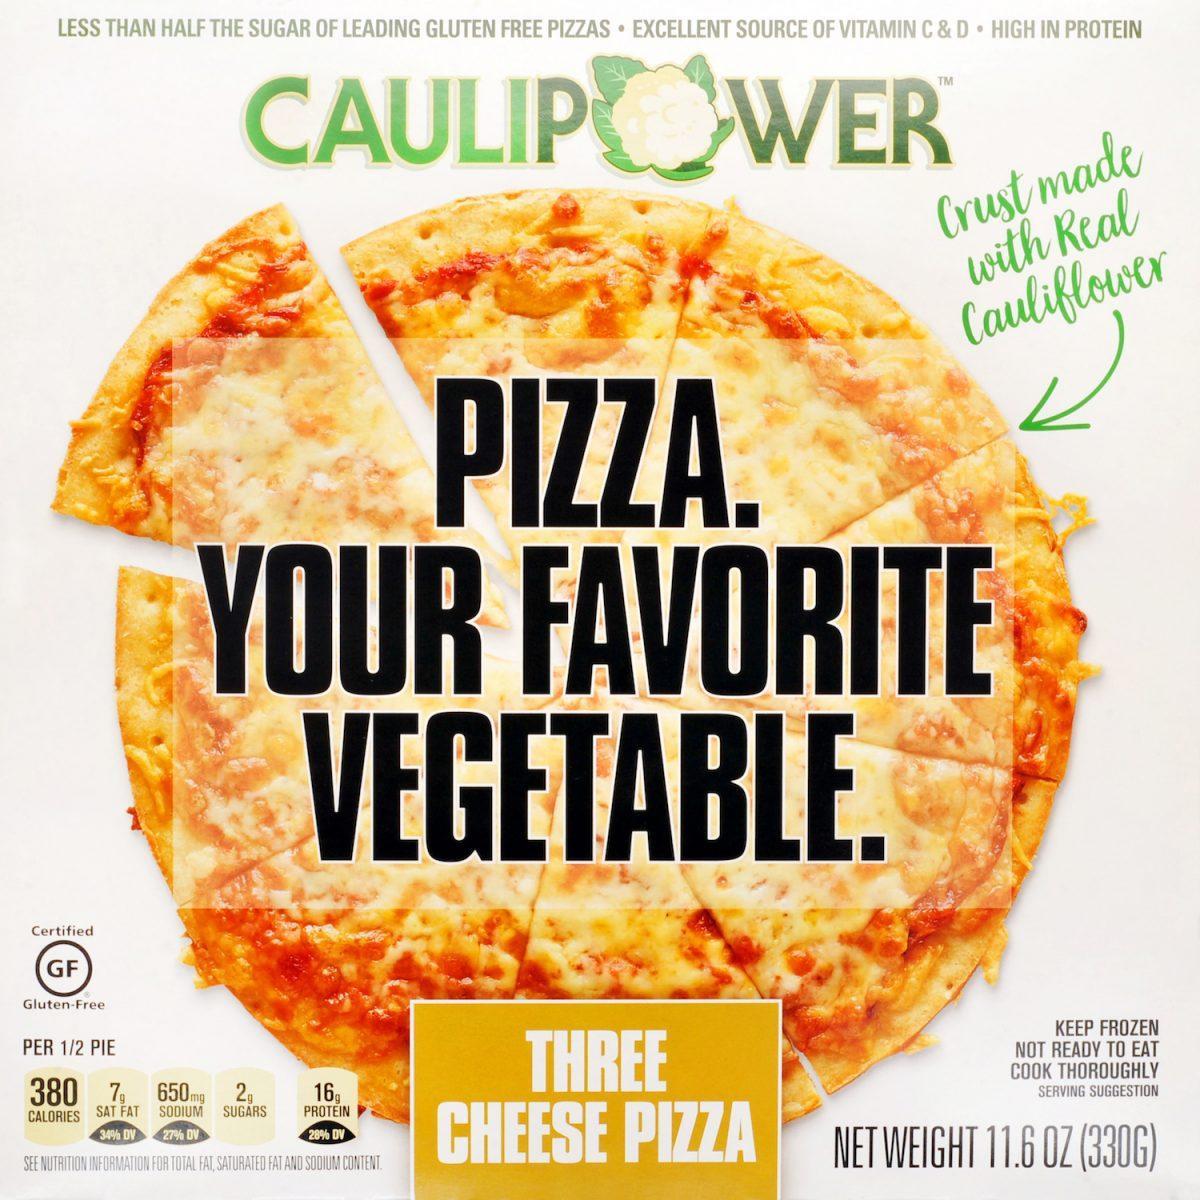 Cauliflower Pizza Crust Where To Buy  Caulipower How This Corporate Executive Left Her